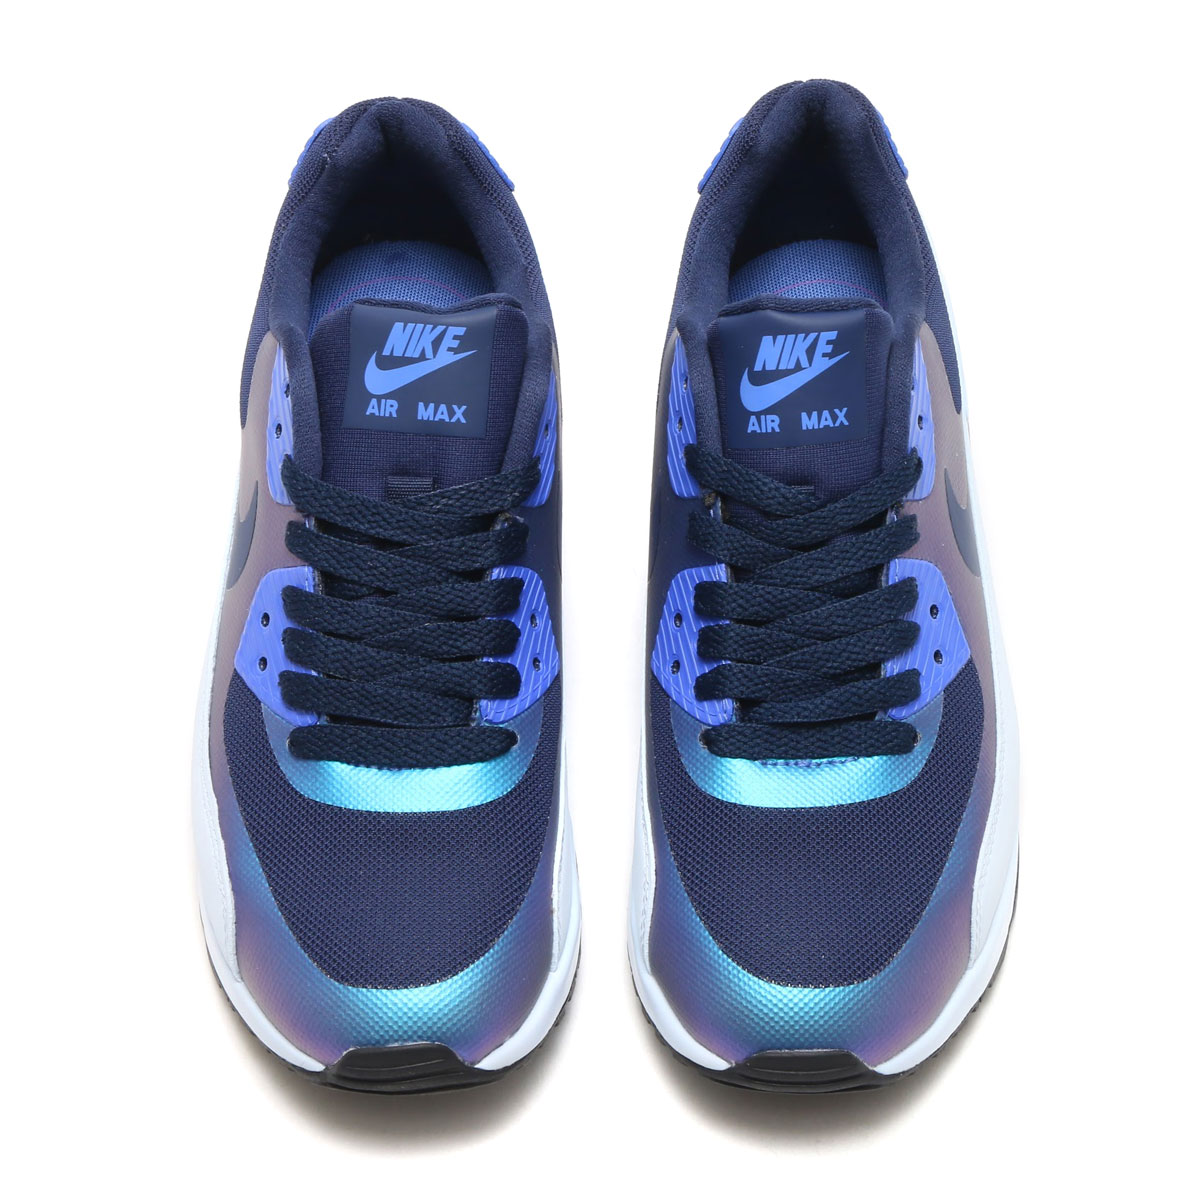 8b2adea8f871 NIKE W AIR MAX 90 ULTRA 2.0 RS (Nike women Air Max 90 ultra 2.0 RS)  (MIDNIGHT NAVY LT BLUE FURY-COMET BLUE) 17HO-S